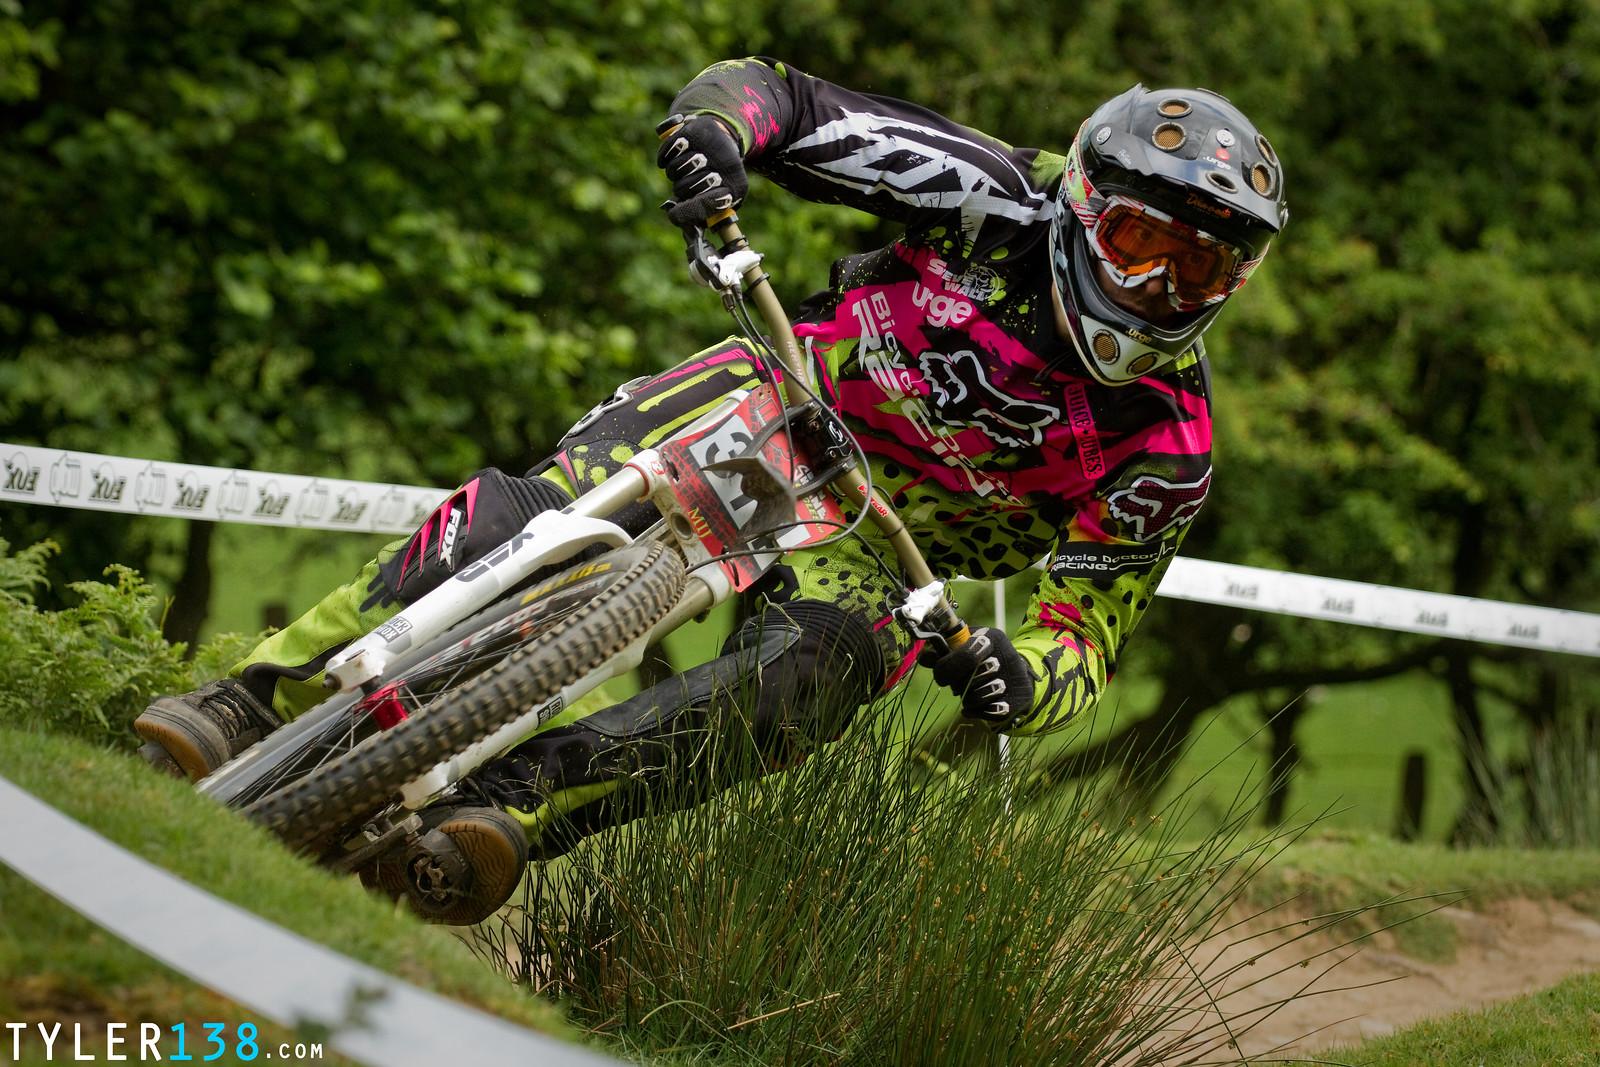 MIJ Taff Buggy Rnd 2 '11 - Scuba Steve - Tyler138 - Mountain Biking Pictures - Vital MTB